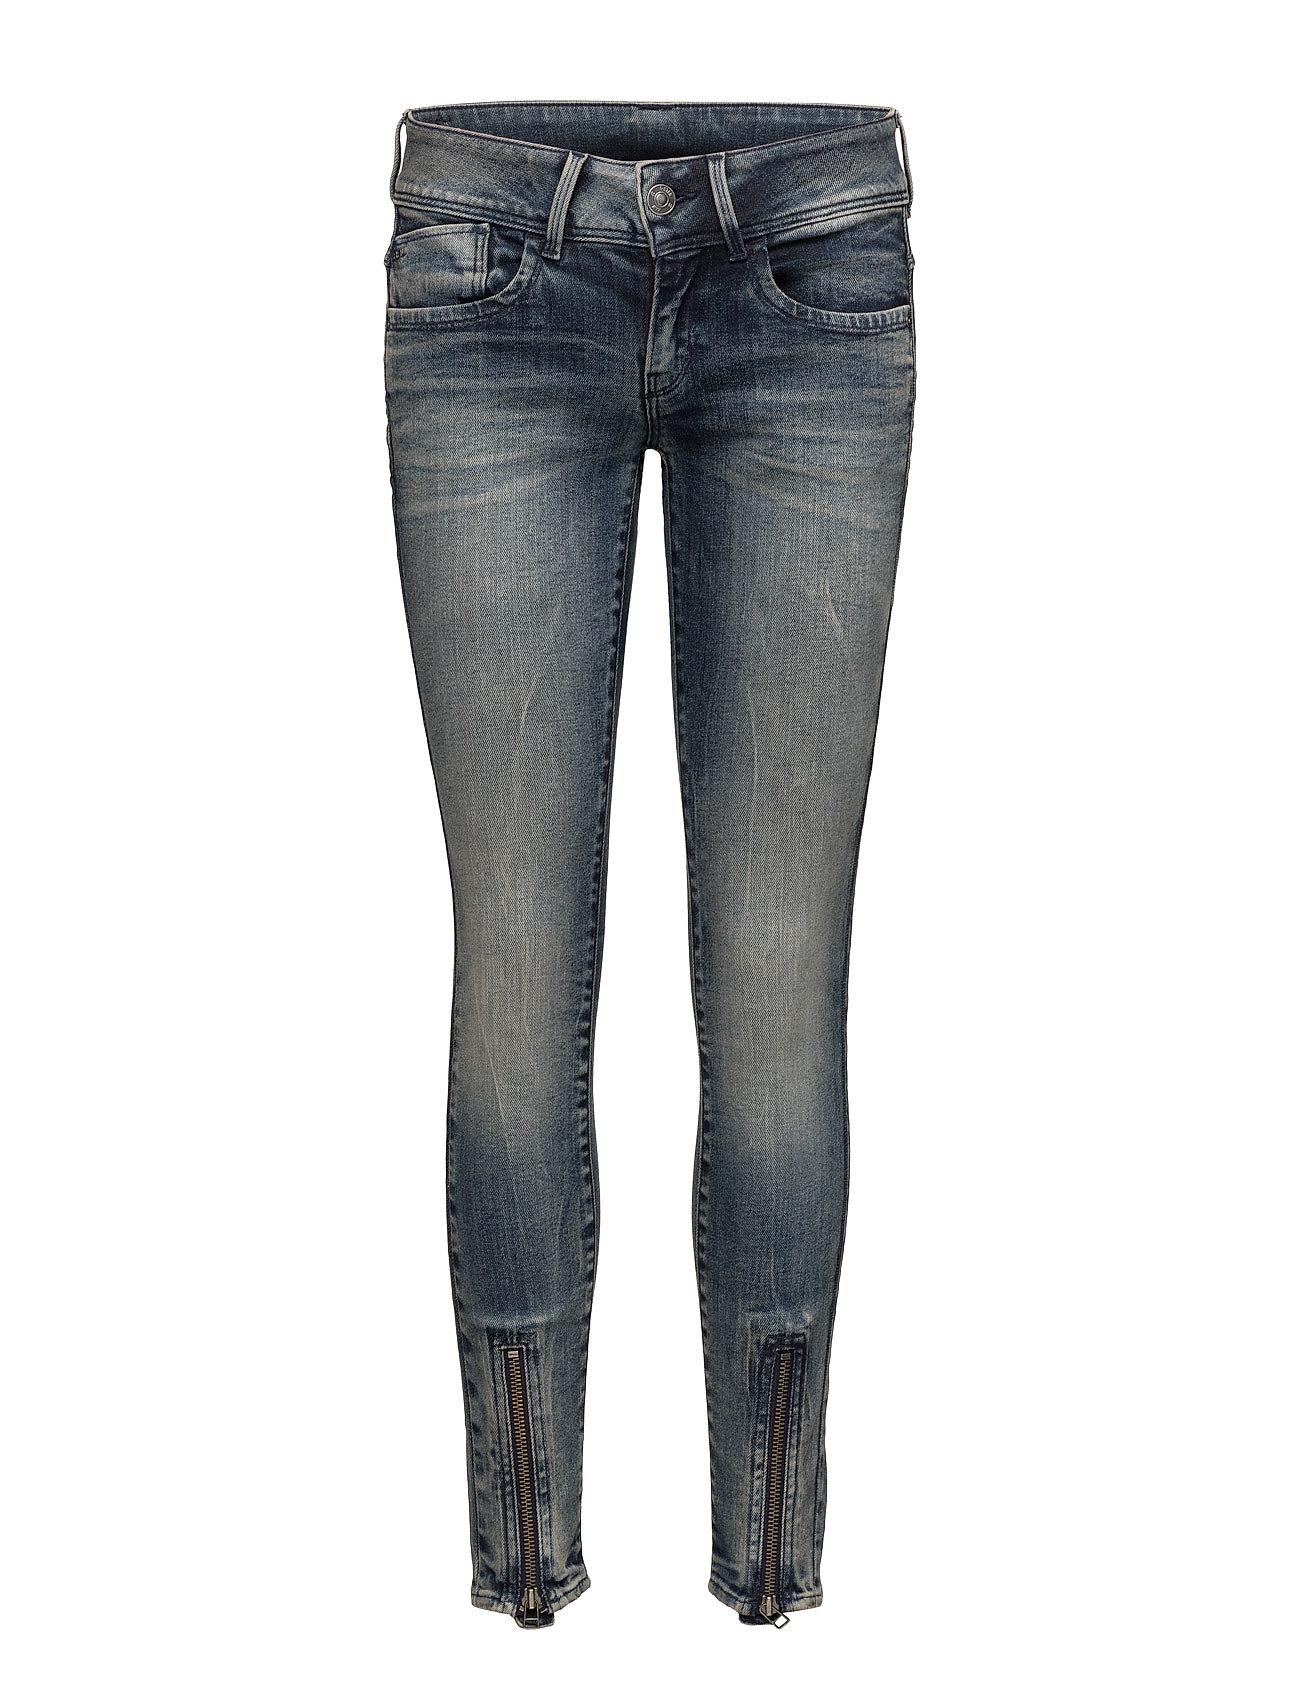 Lynn Zip Grip Mid Skinny Wmn G-star Jeans til Kvinder i